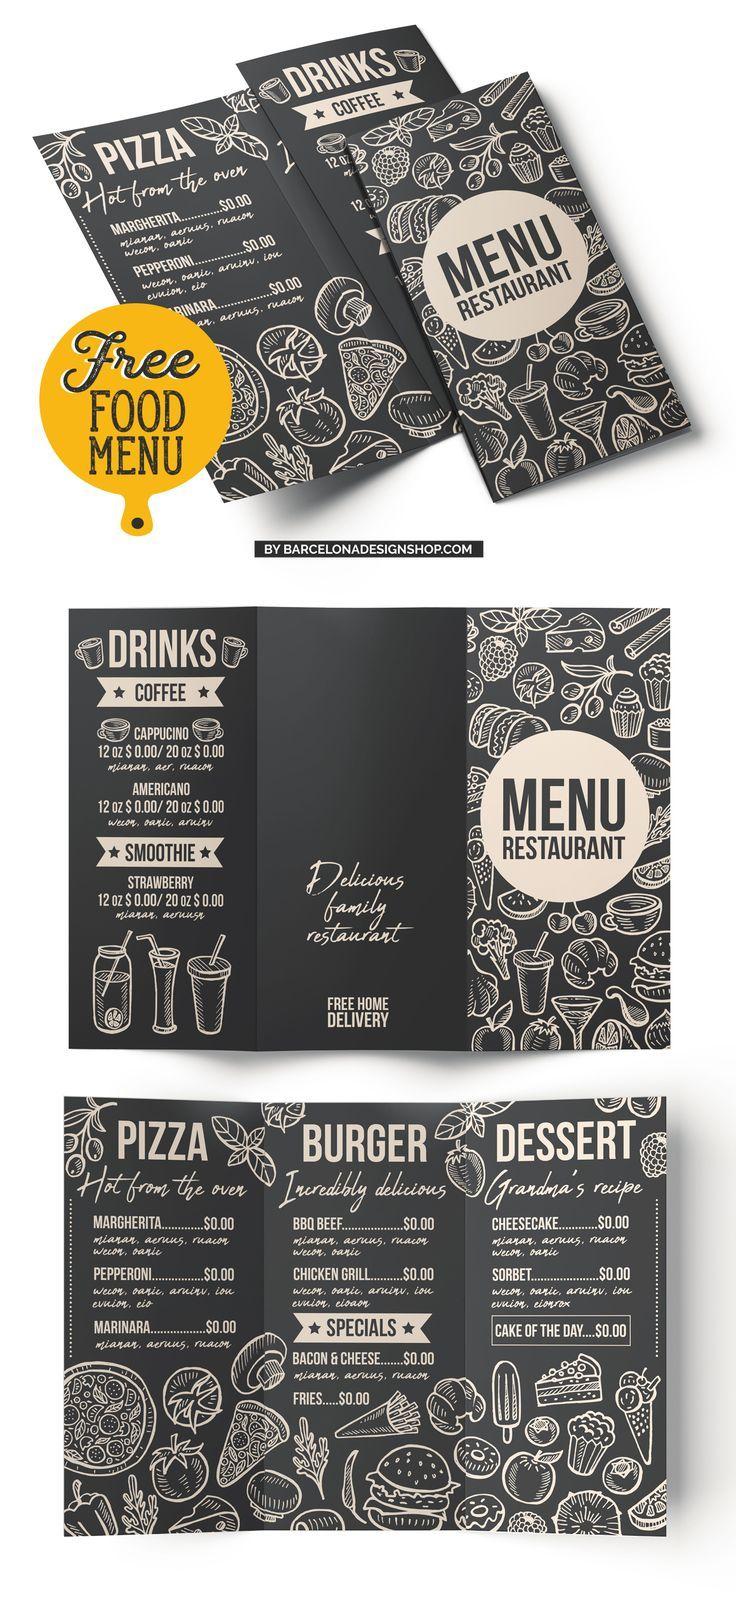 Free Food Menu Template Cafe Menu Design Food Menu Template